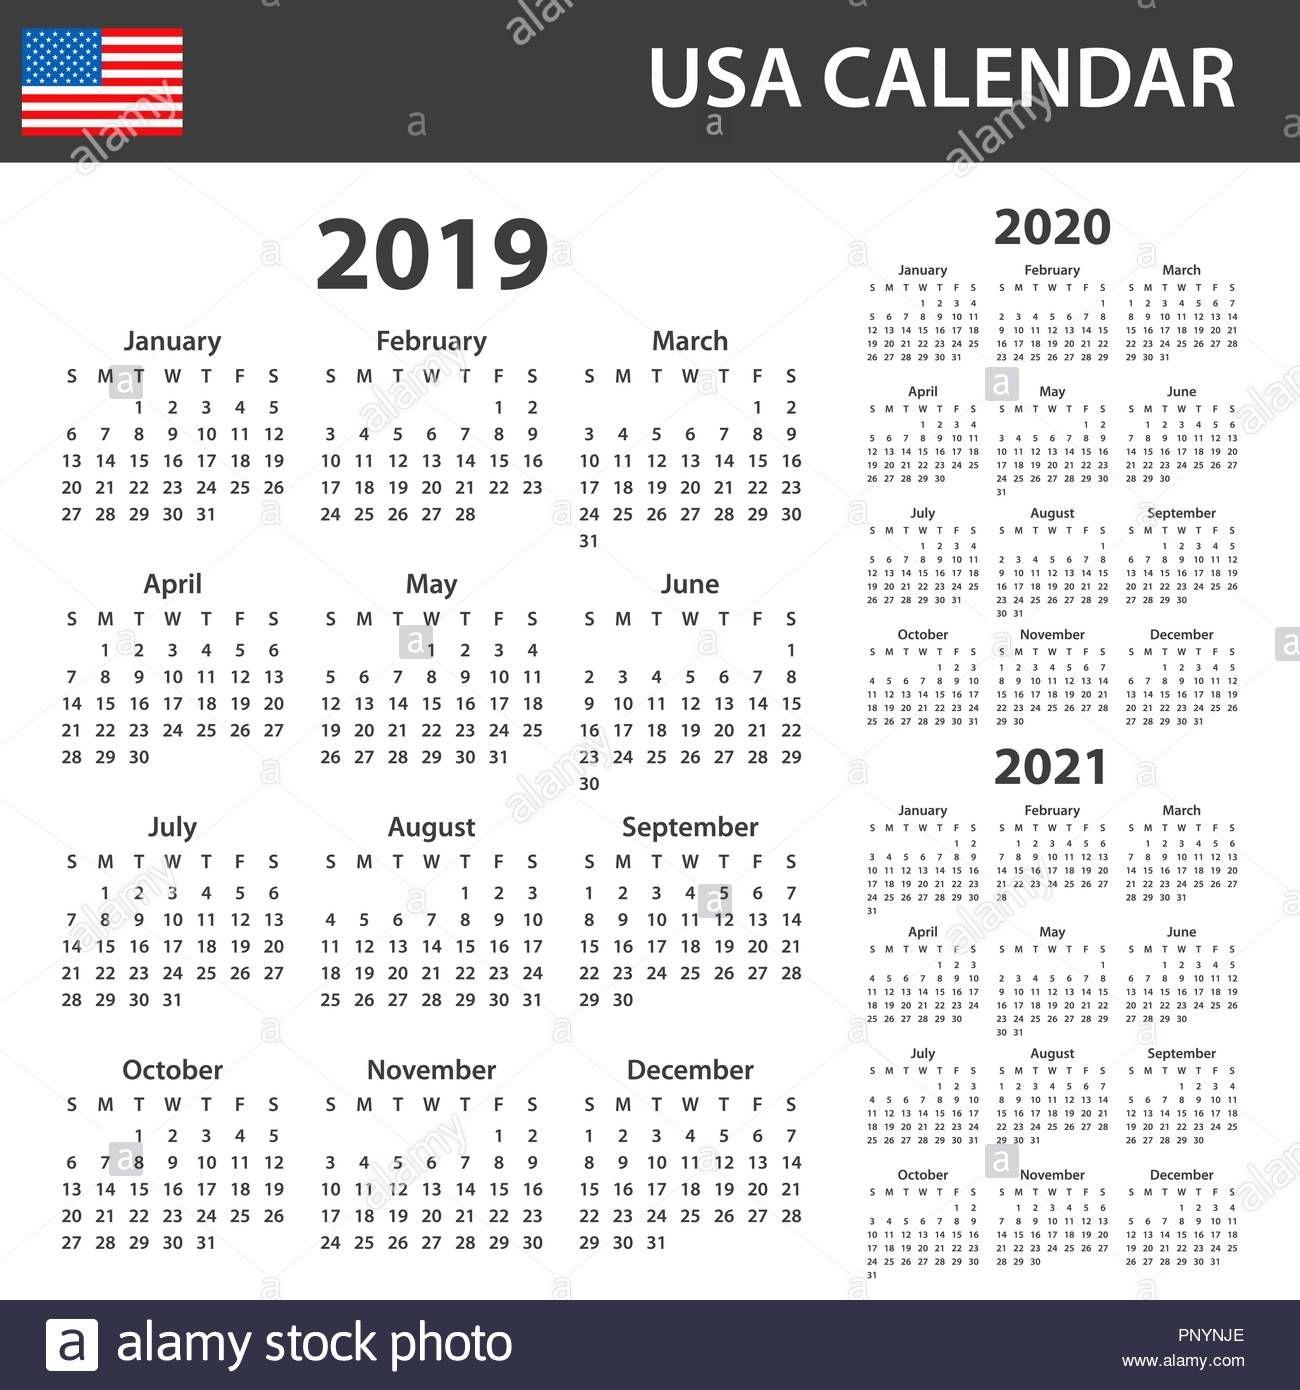 Usa Calendar For 2019, 2020 And 2021. Scheduler, Agenda Or